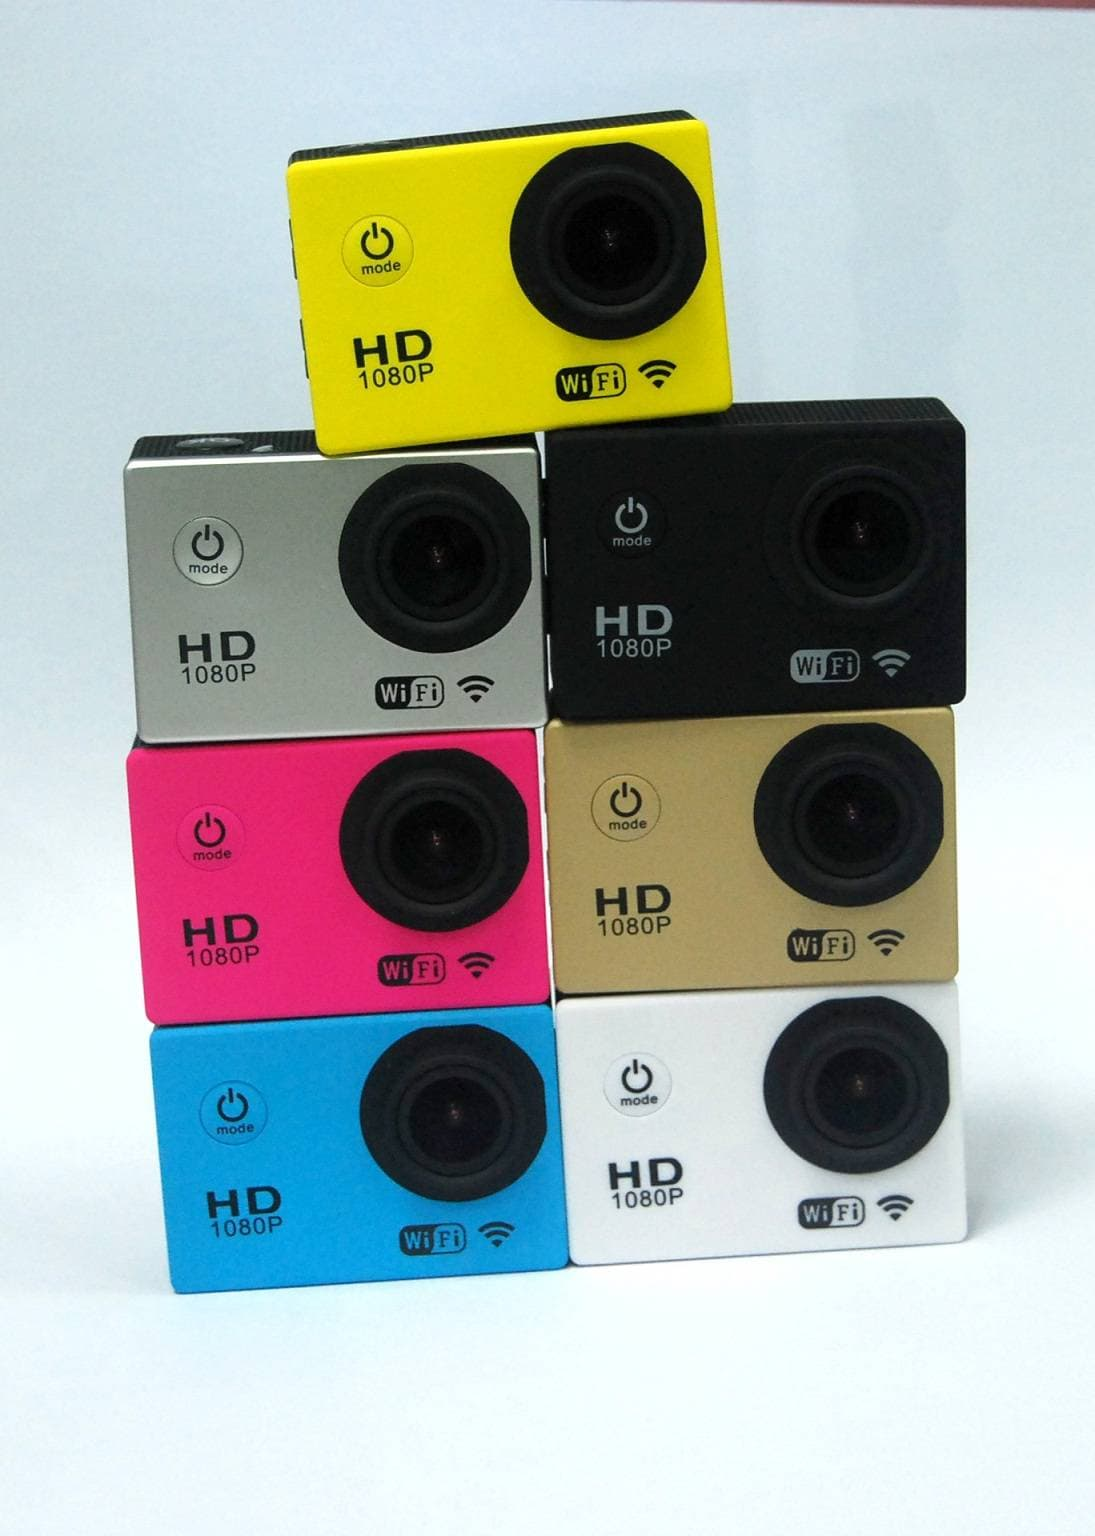 Auto Transportationauto Electronics Tradekorea Sports Cam Action Camera Sport Mini 1080p H264 Full Hd No Wifi Product Thumnail Image